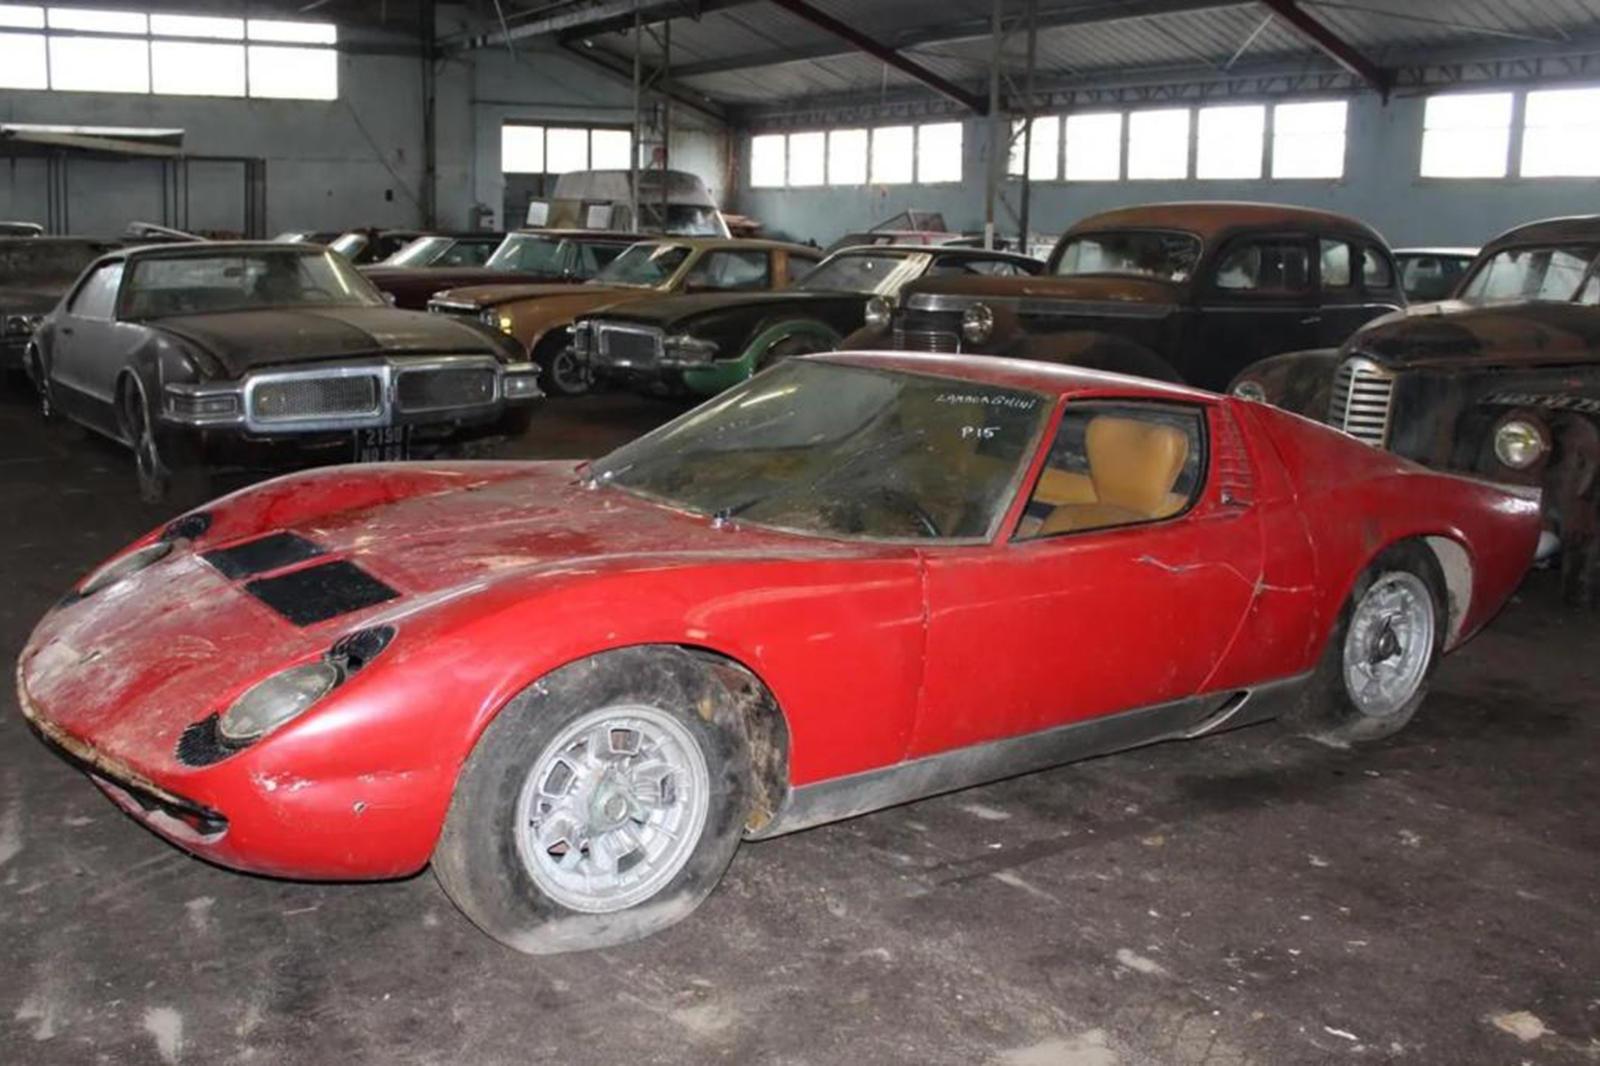 Incredible 81 Car Barn Find Includes This Dusty Lamborghini Miura